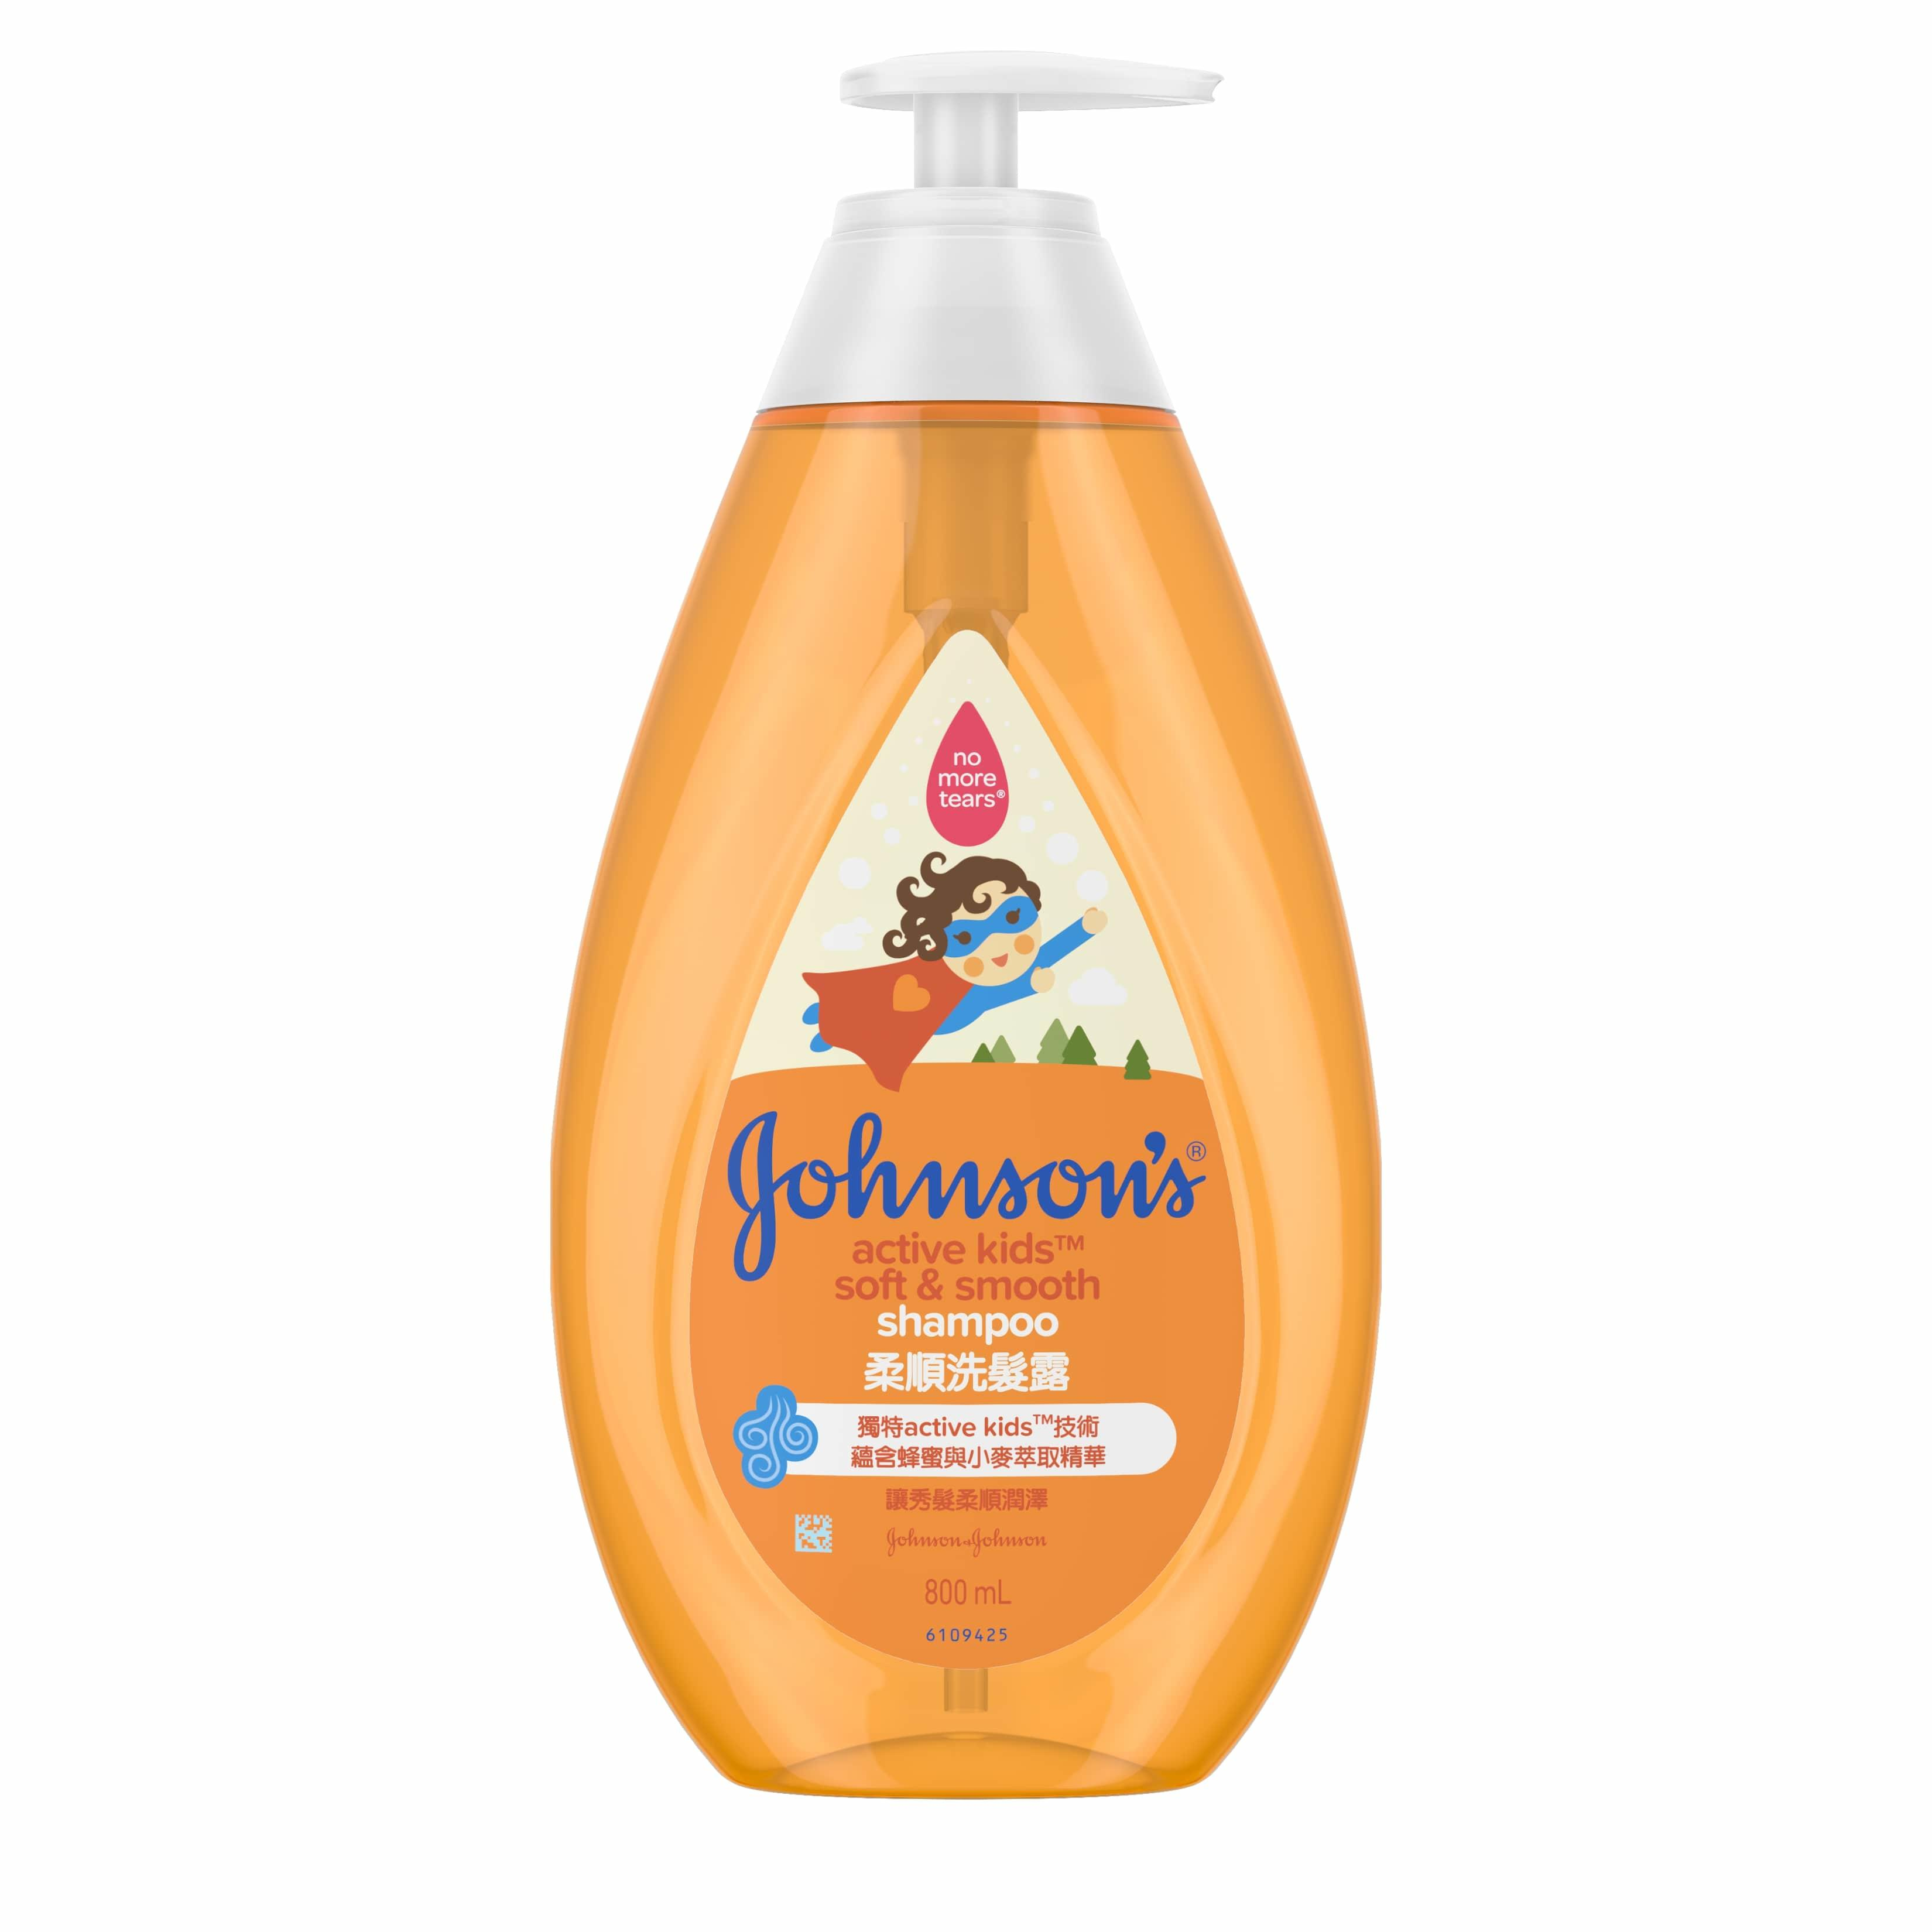 active-kids-soft-smooth-shampoo-800ml-front.jpg